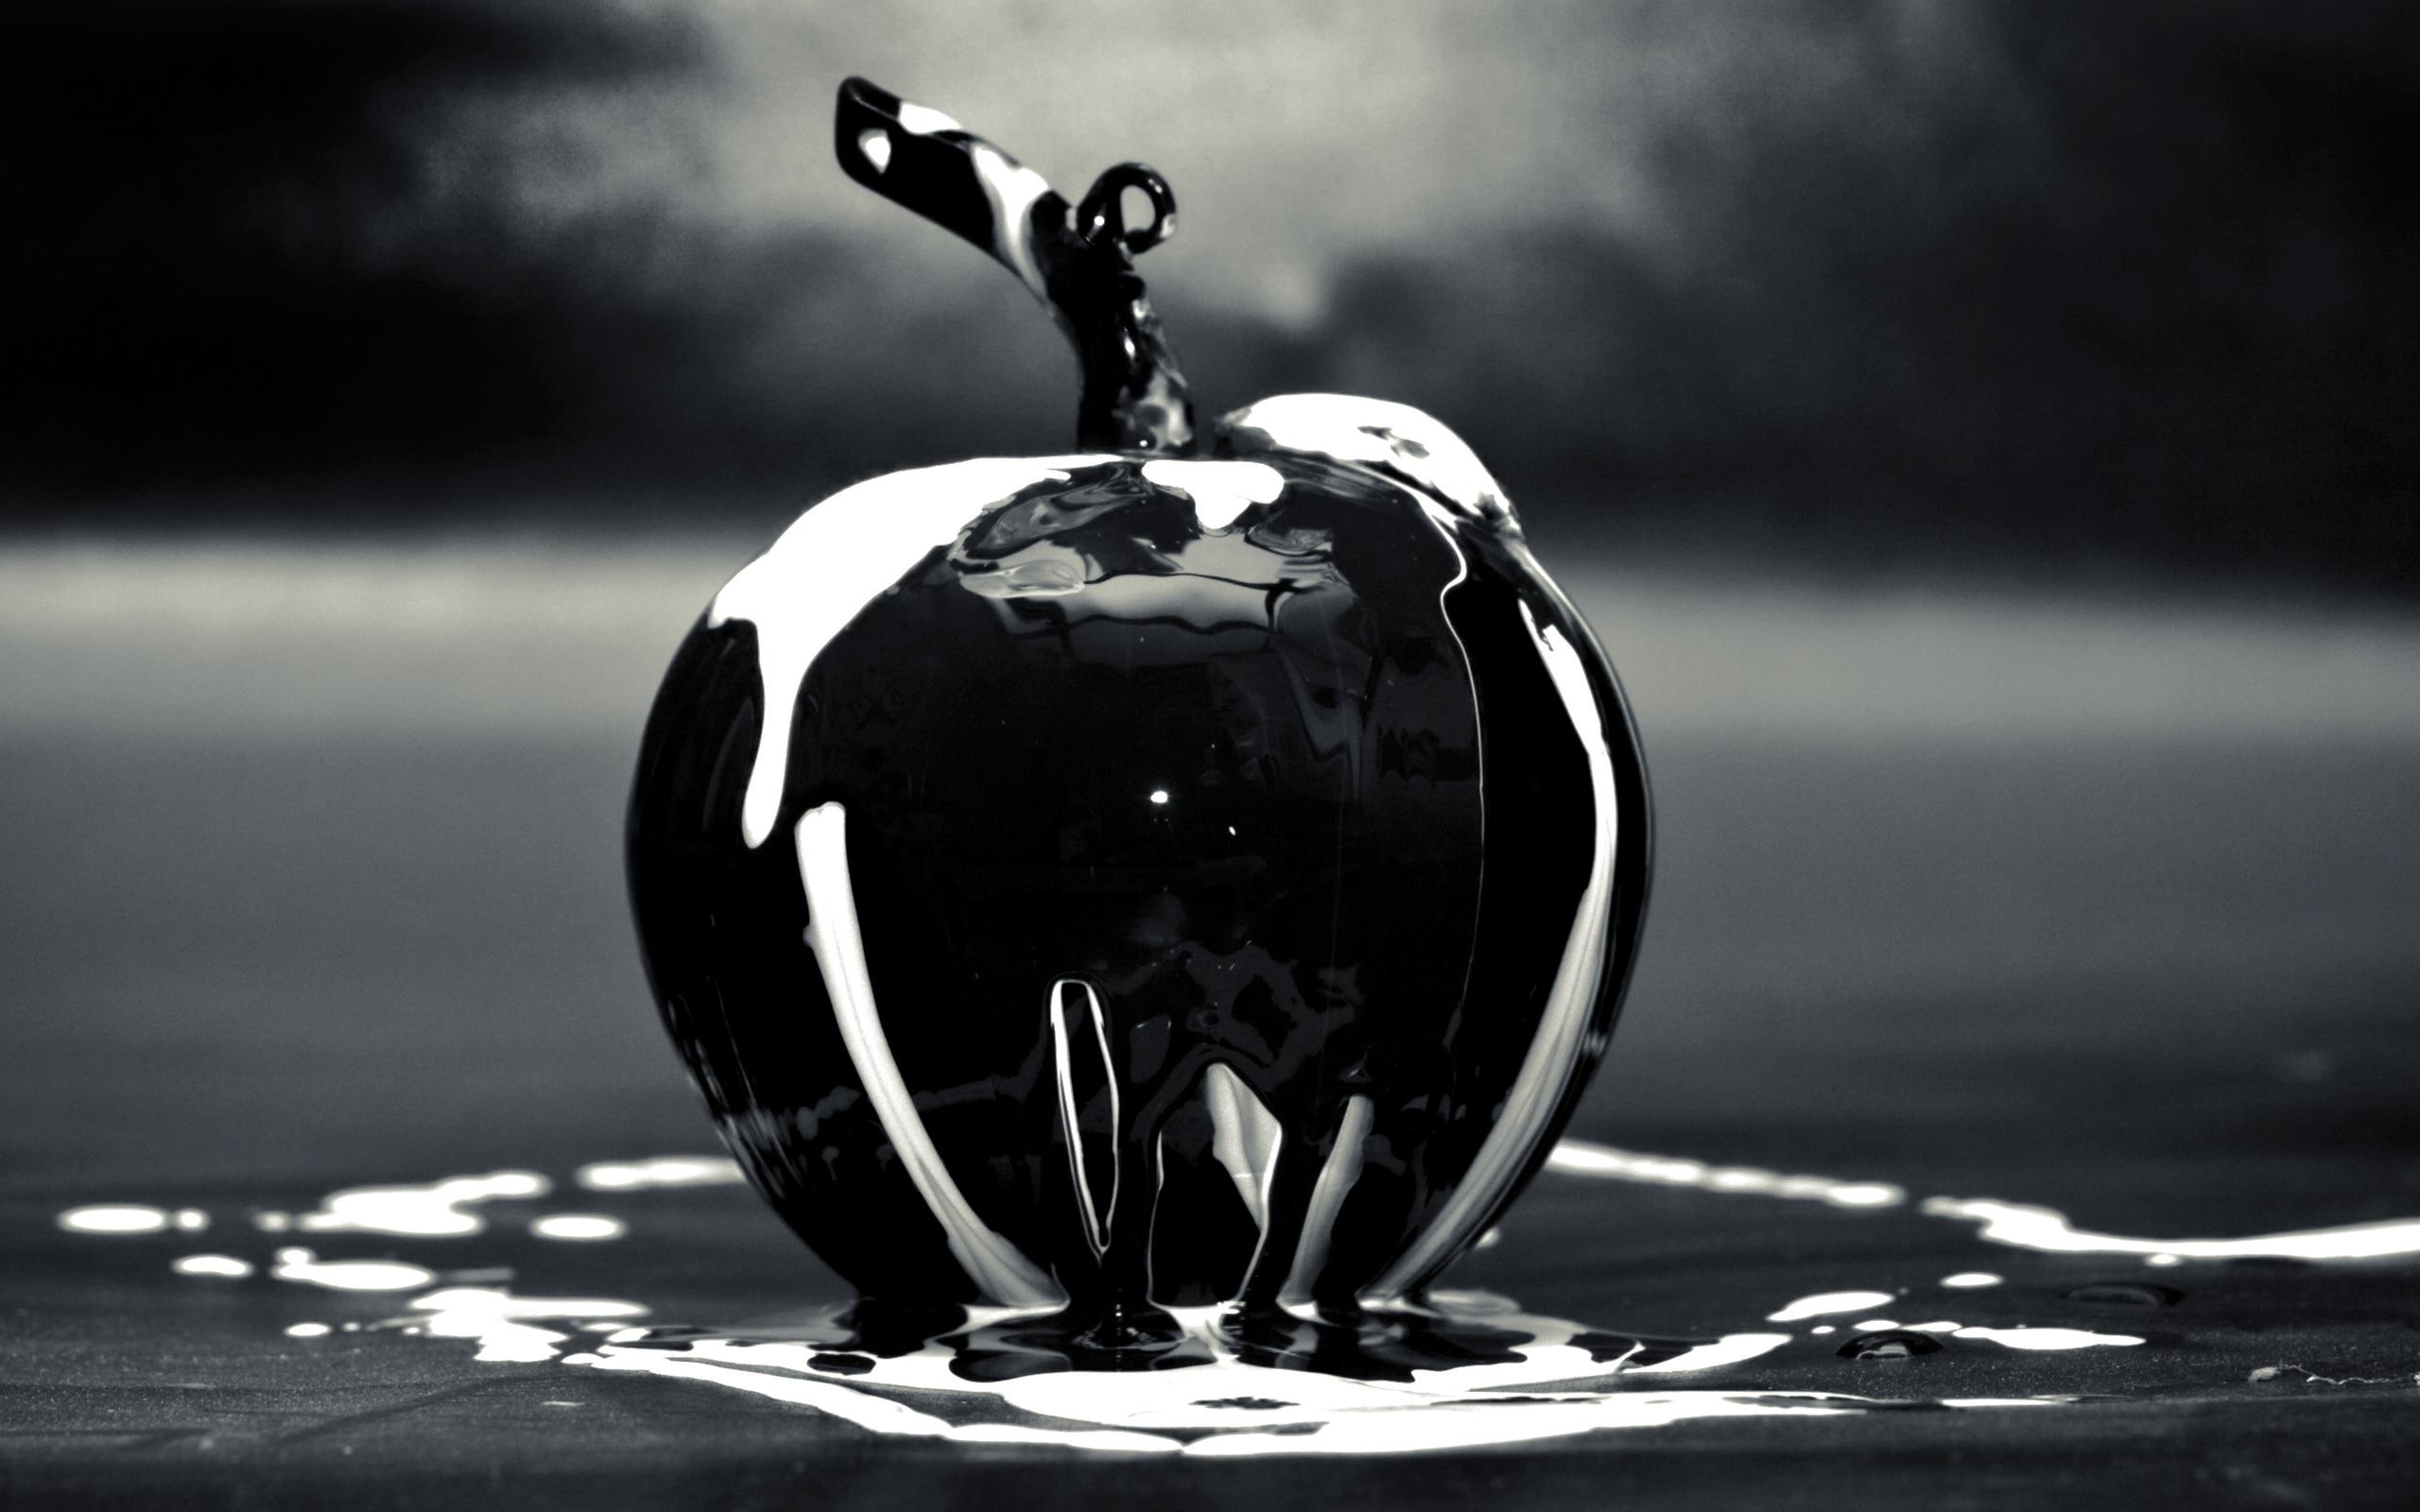 art-cool-creative-apple-3d-black-and-white-black-wallpaper-creativity-still-life-2560x1600.jpg